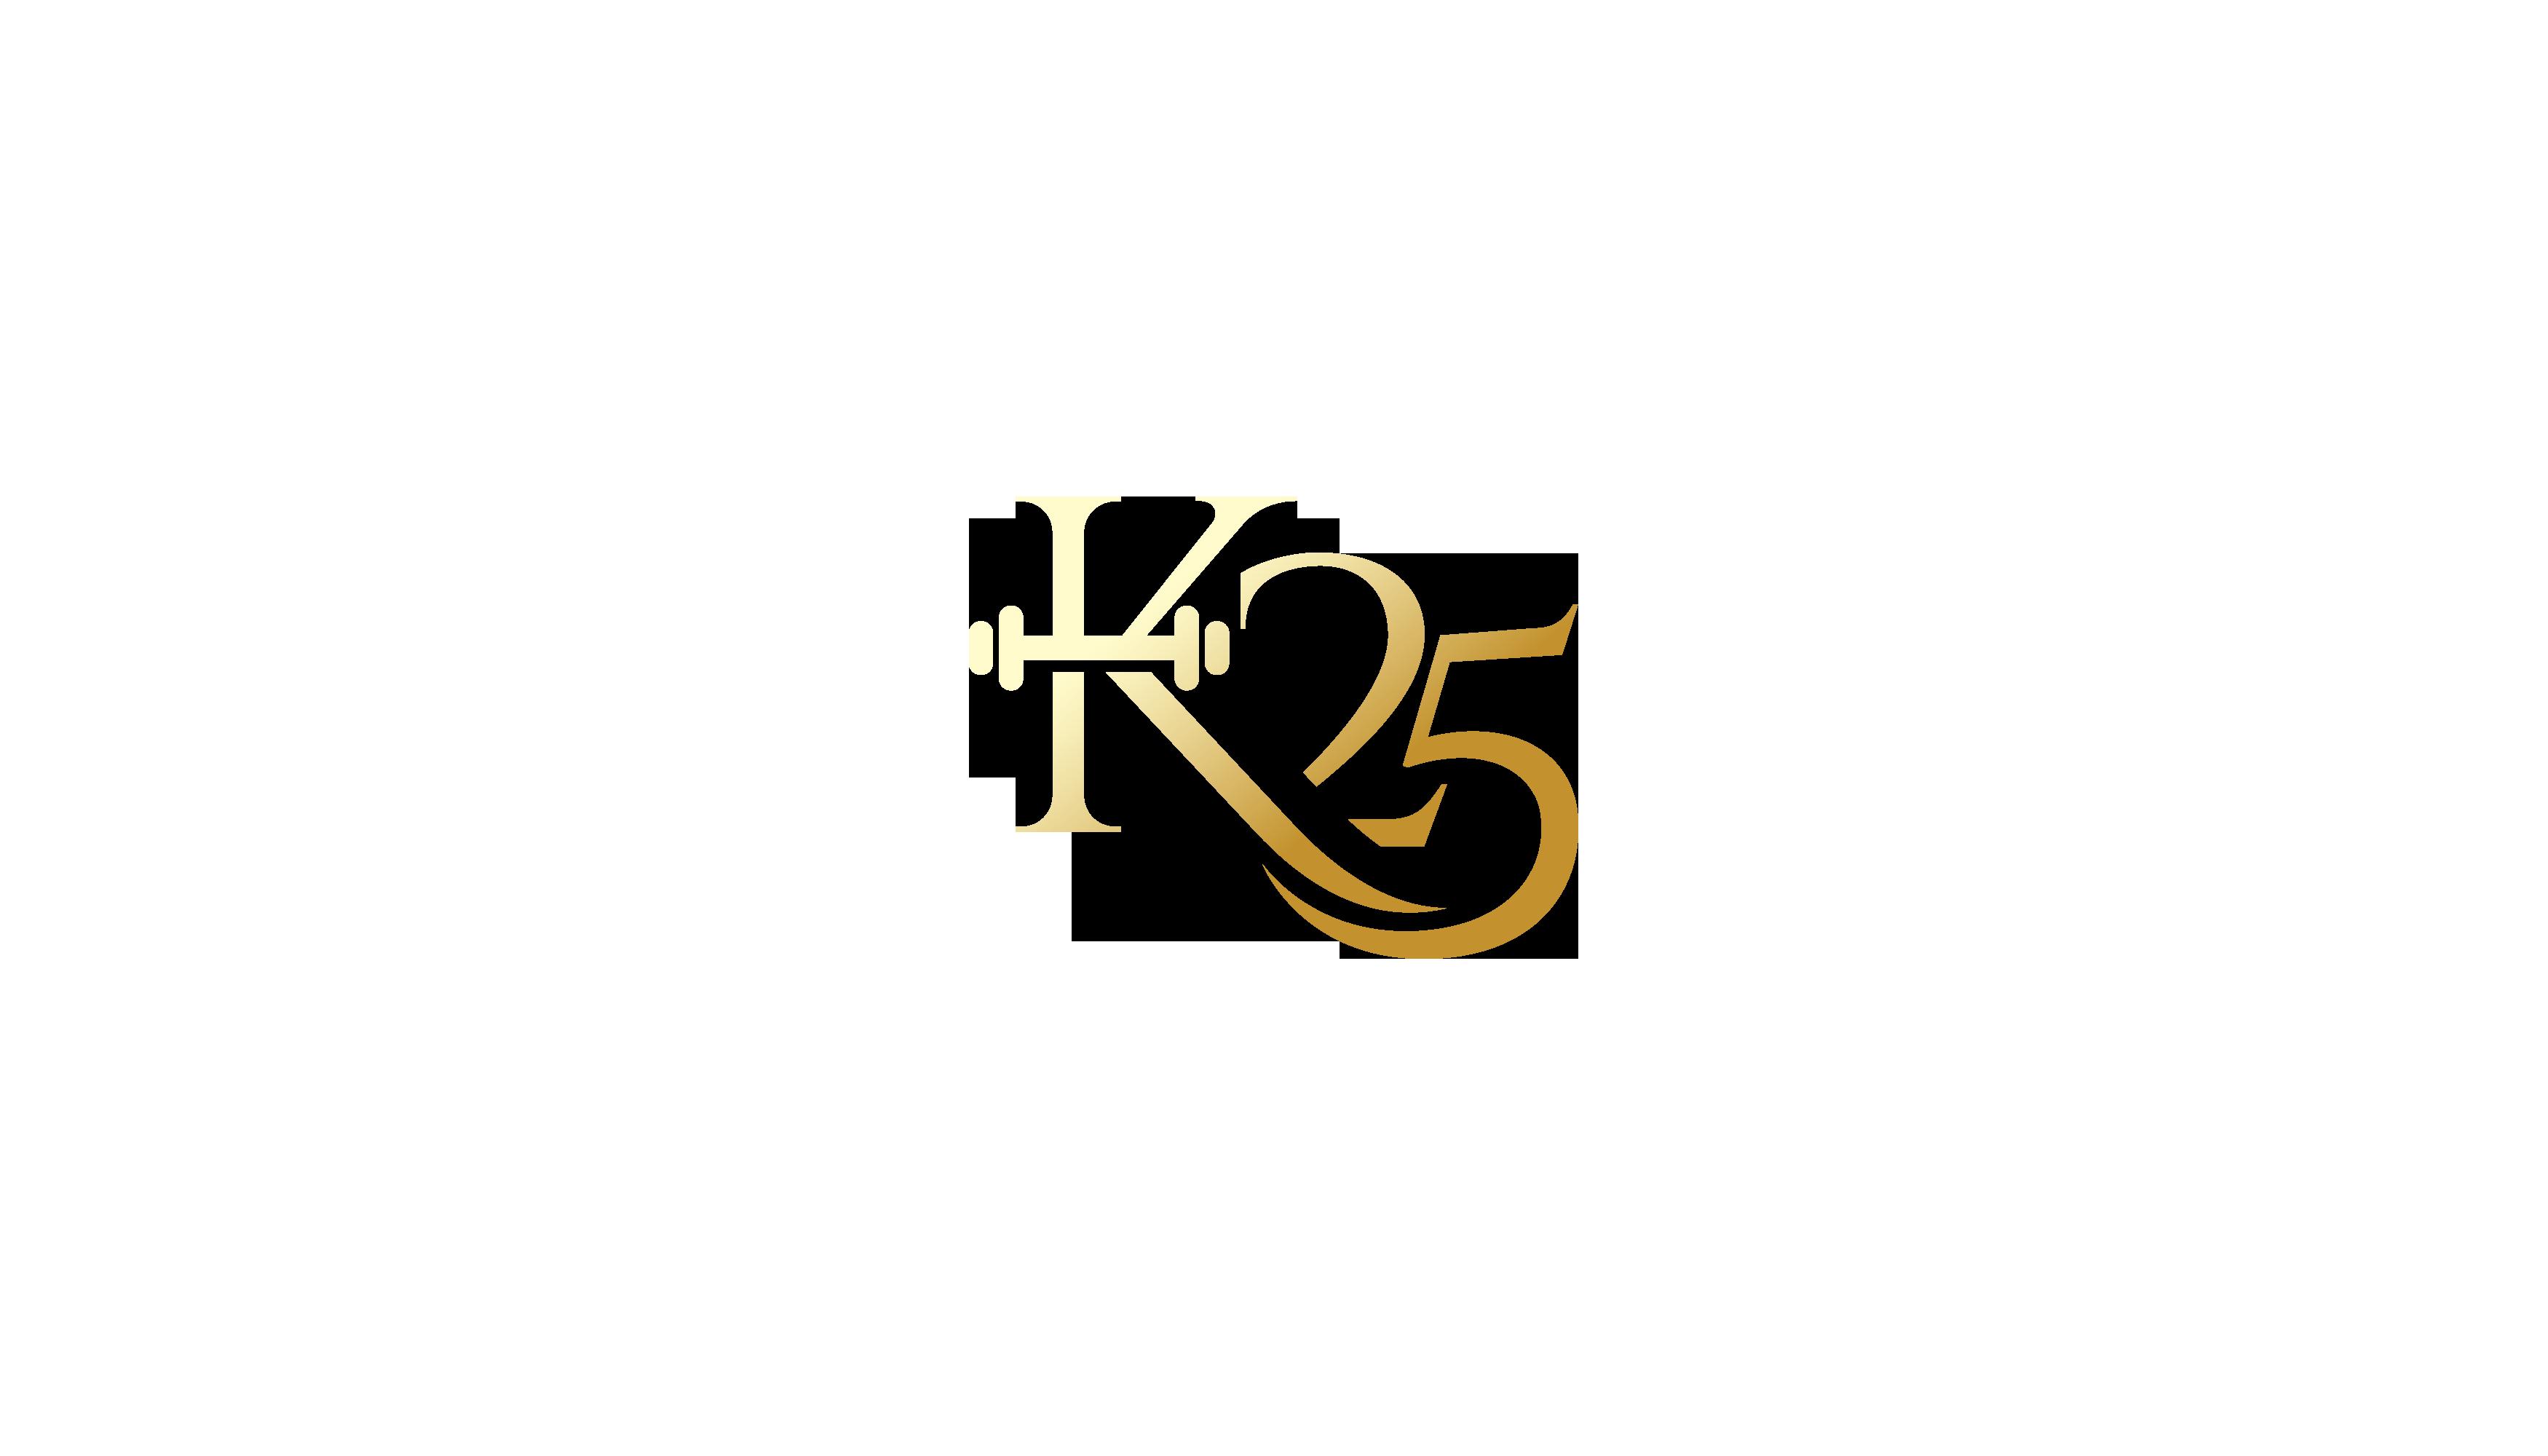 K25-style